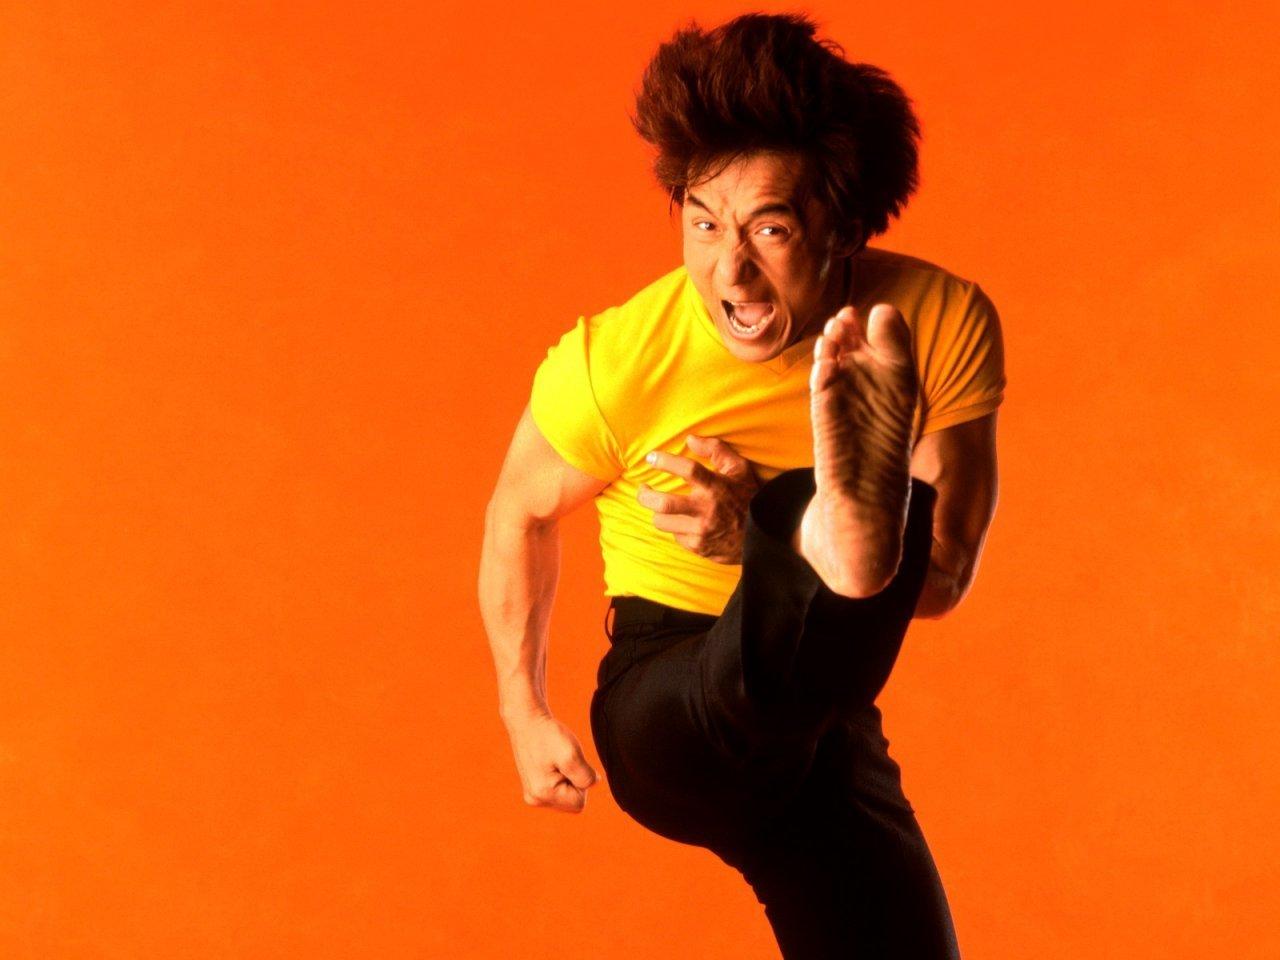 Джеки Чан, Jackie Chan,актер, каскадер